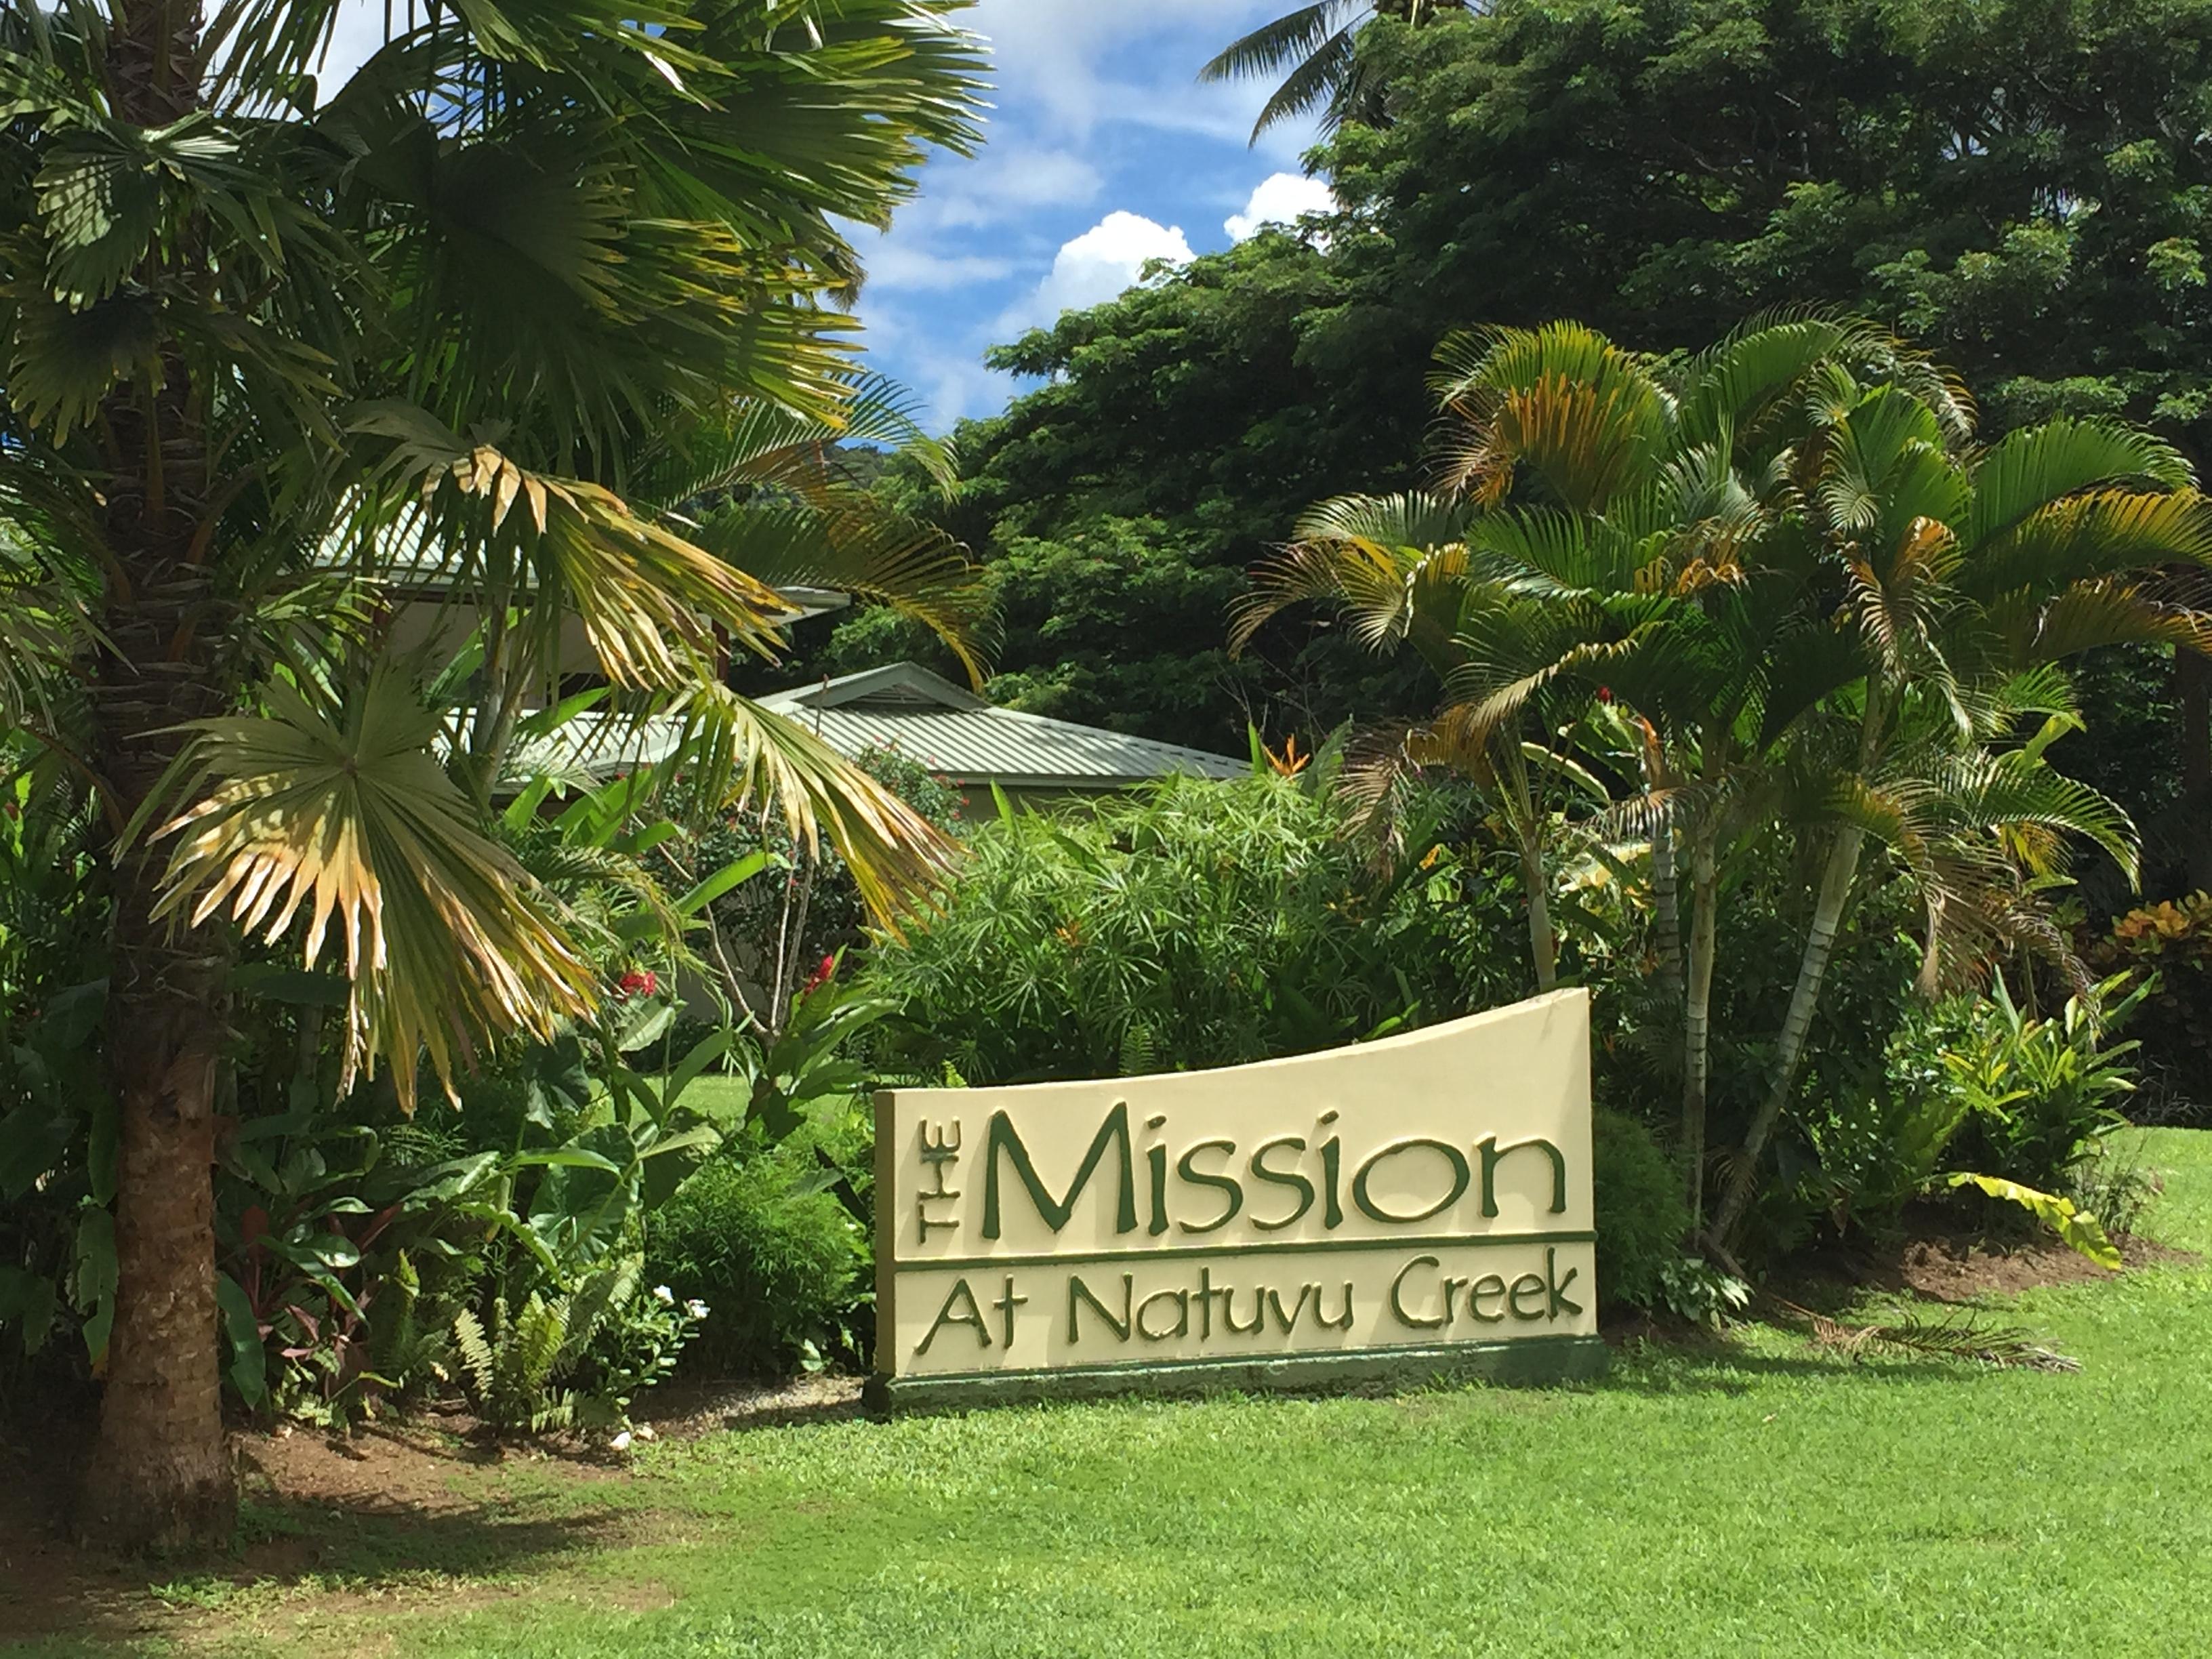 10.1 Mission sign